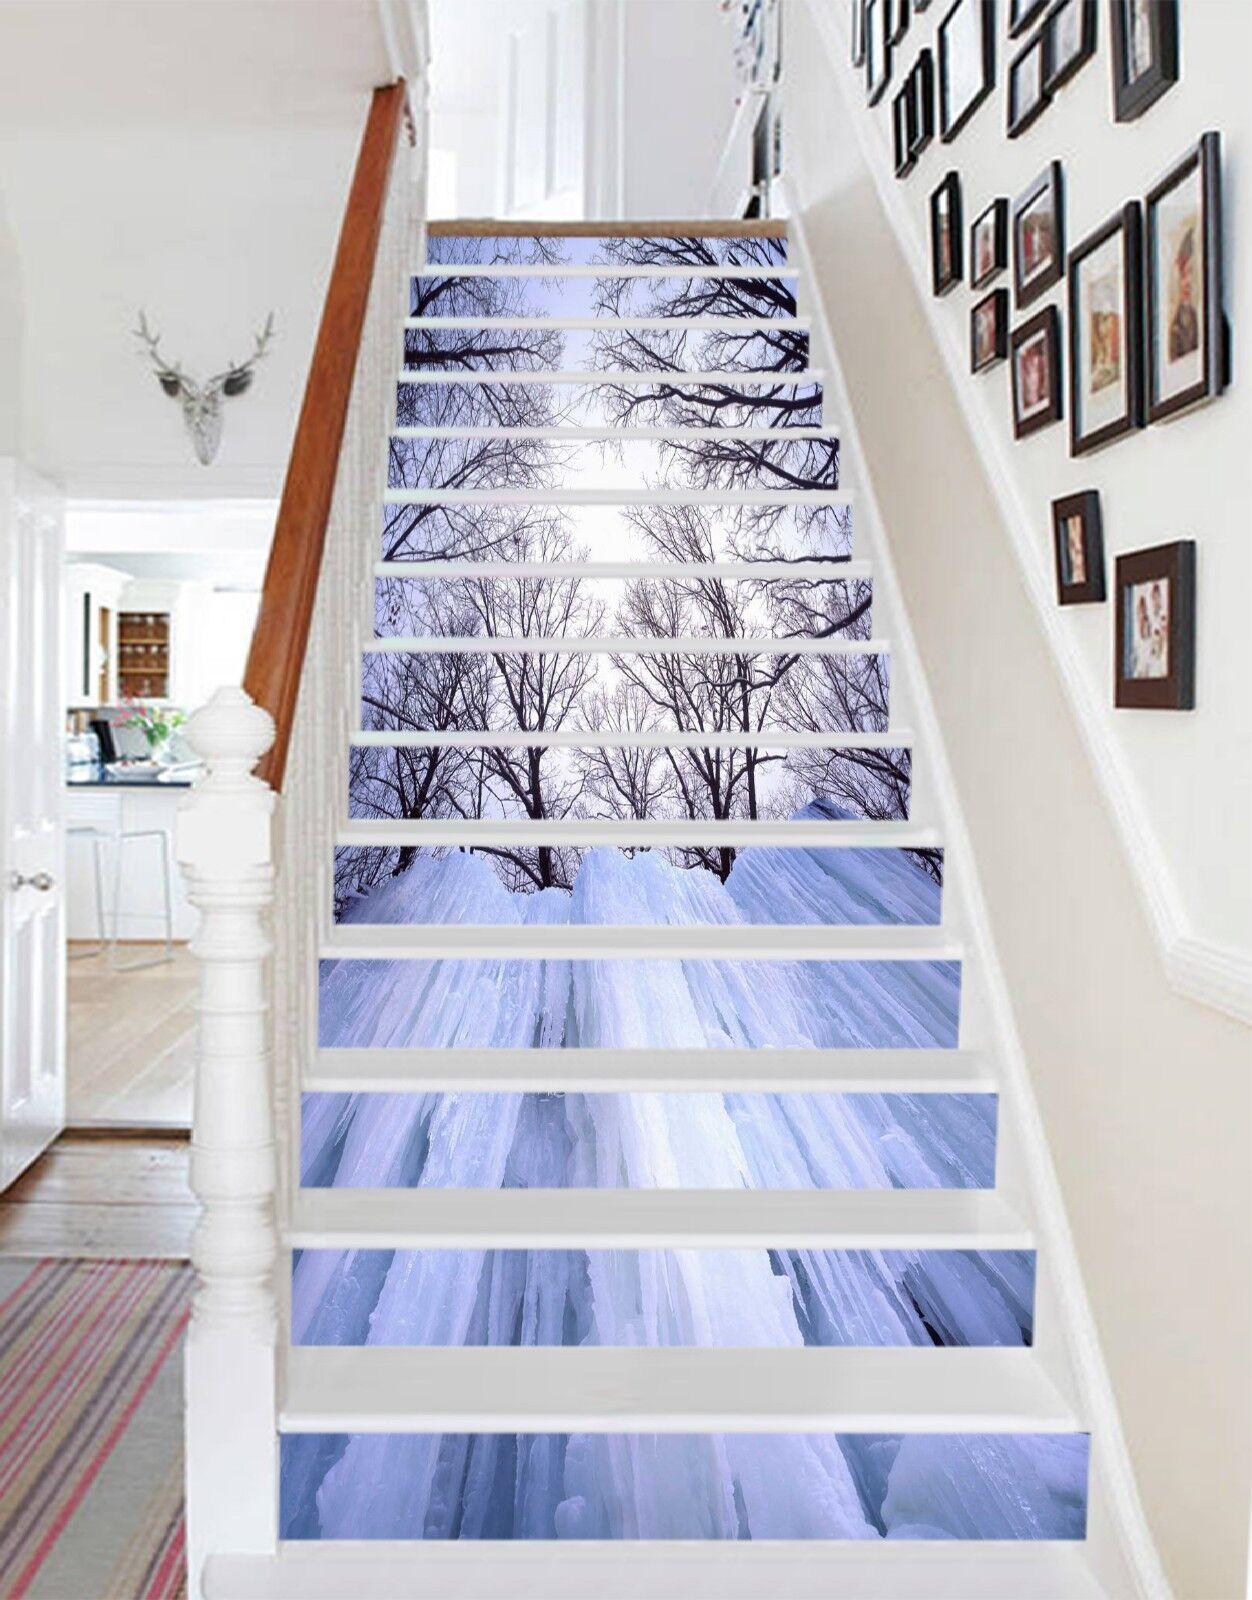 3D Eiszapfen 2993 Stair Risers Dekoration Fototapete Vinyl Aufkleber Tapete DE